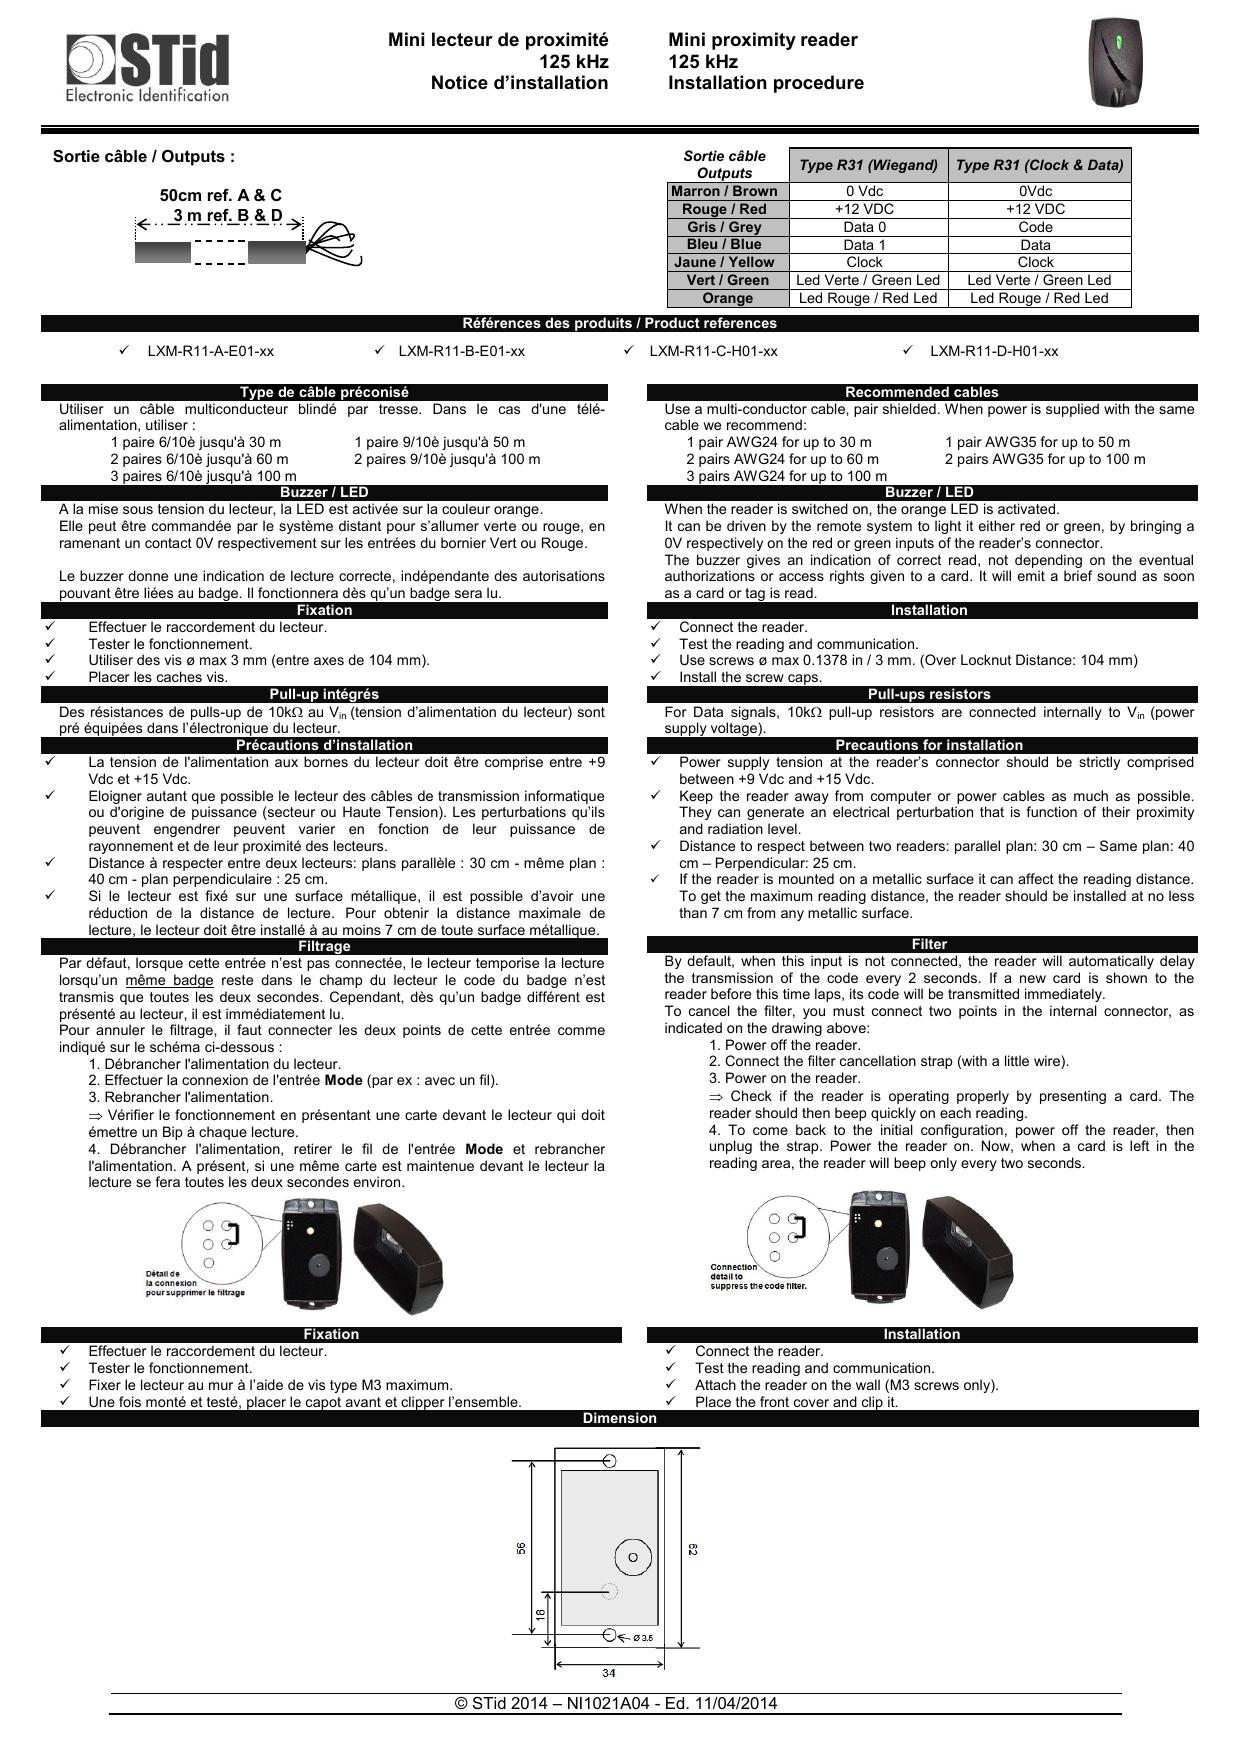 Mini lecteur proximité 125 kHz STID LXM